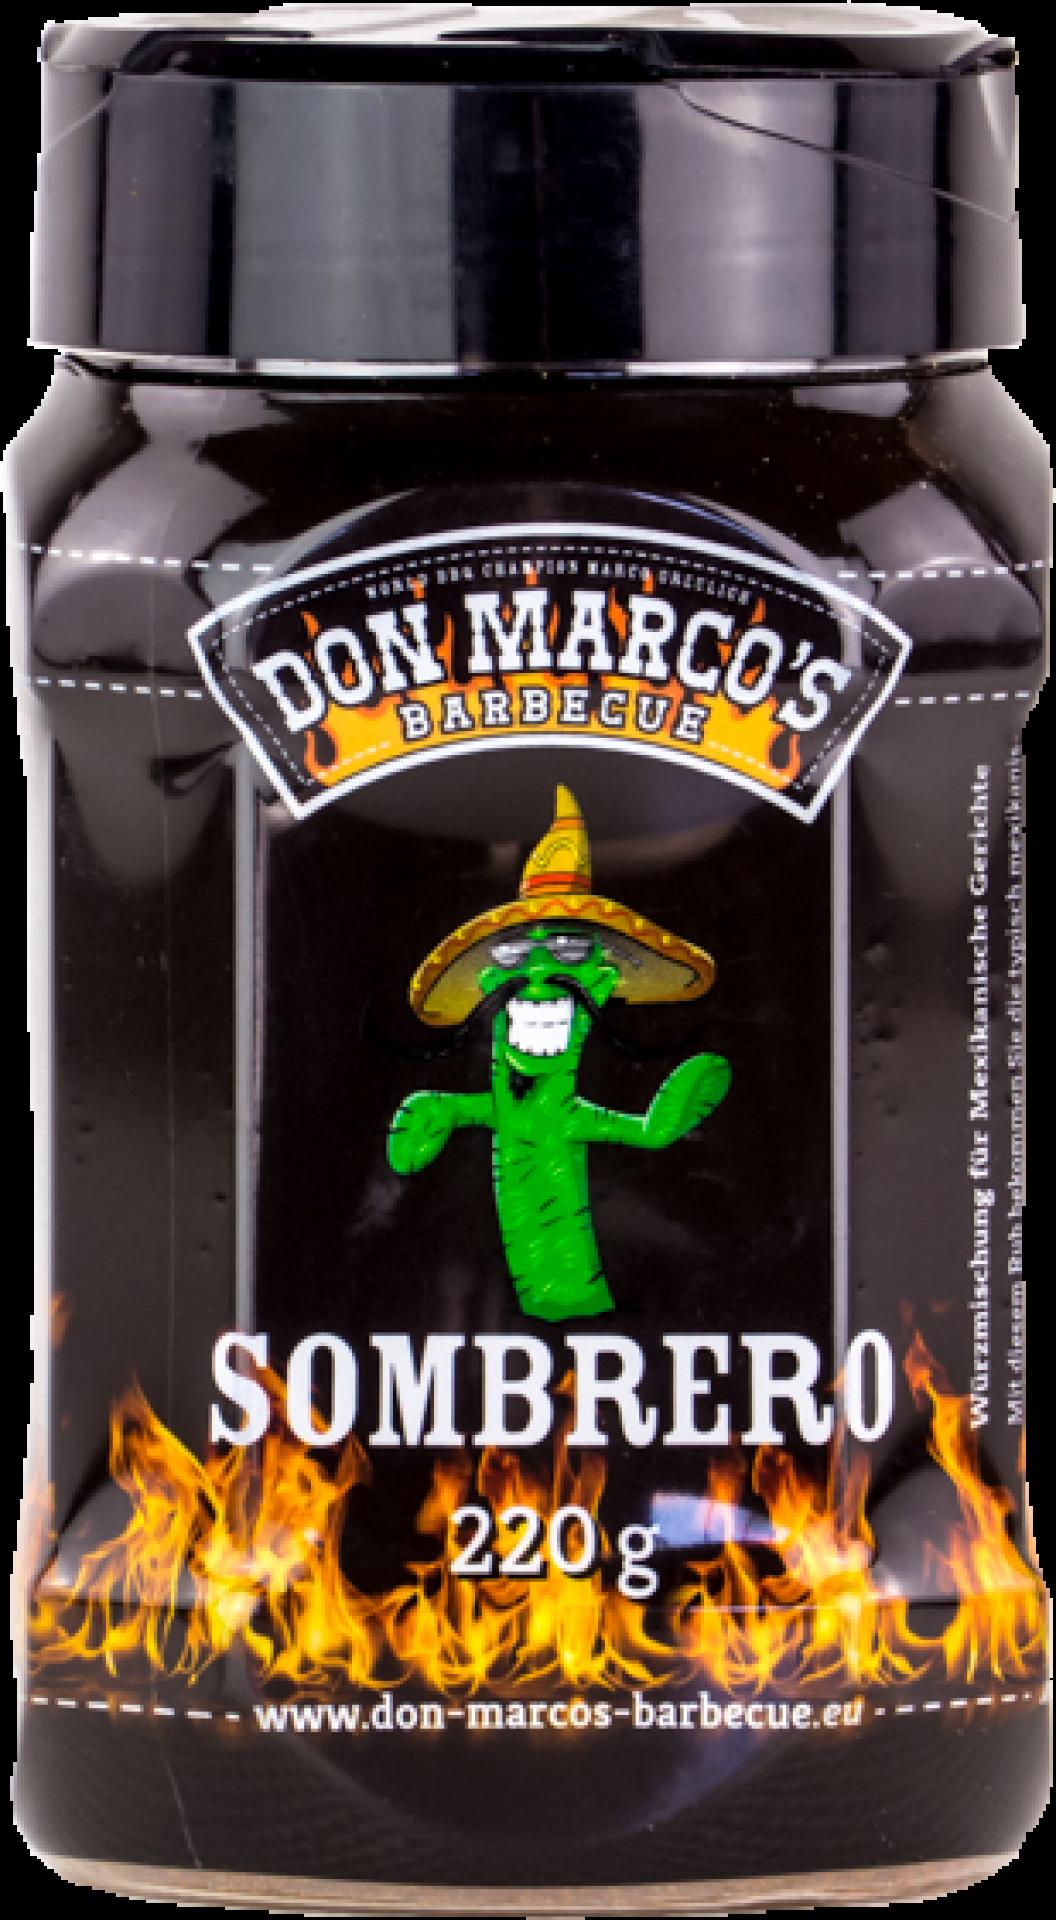 Don Marco's Sombrero Grillgewürz (PET Dose) 220g